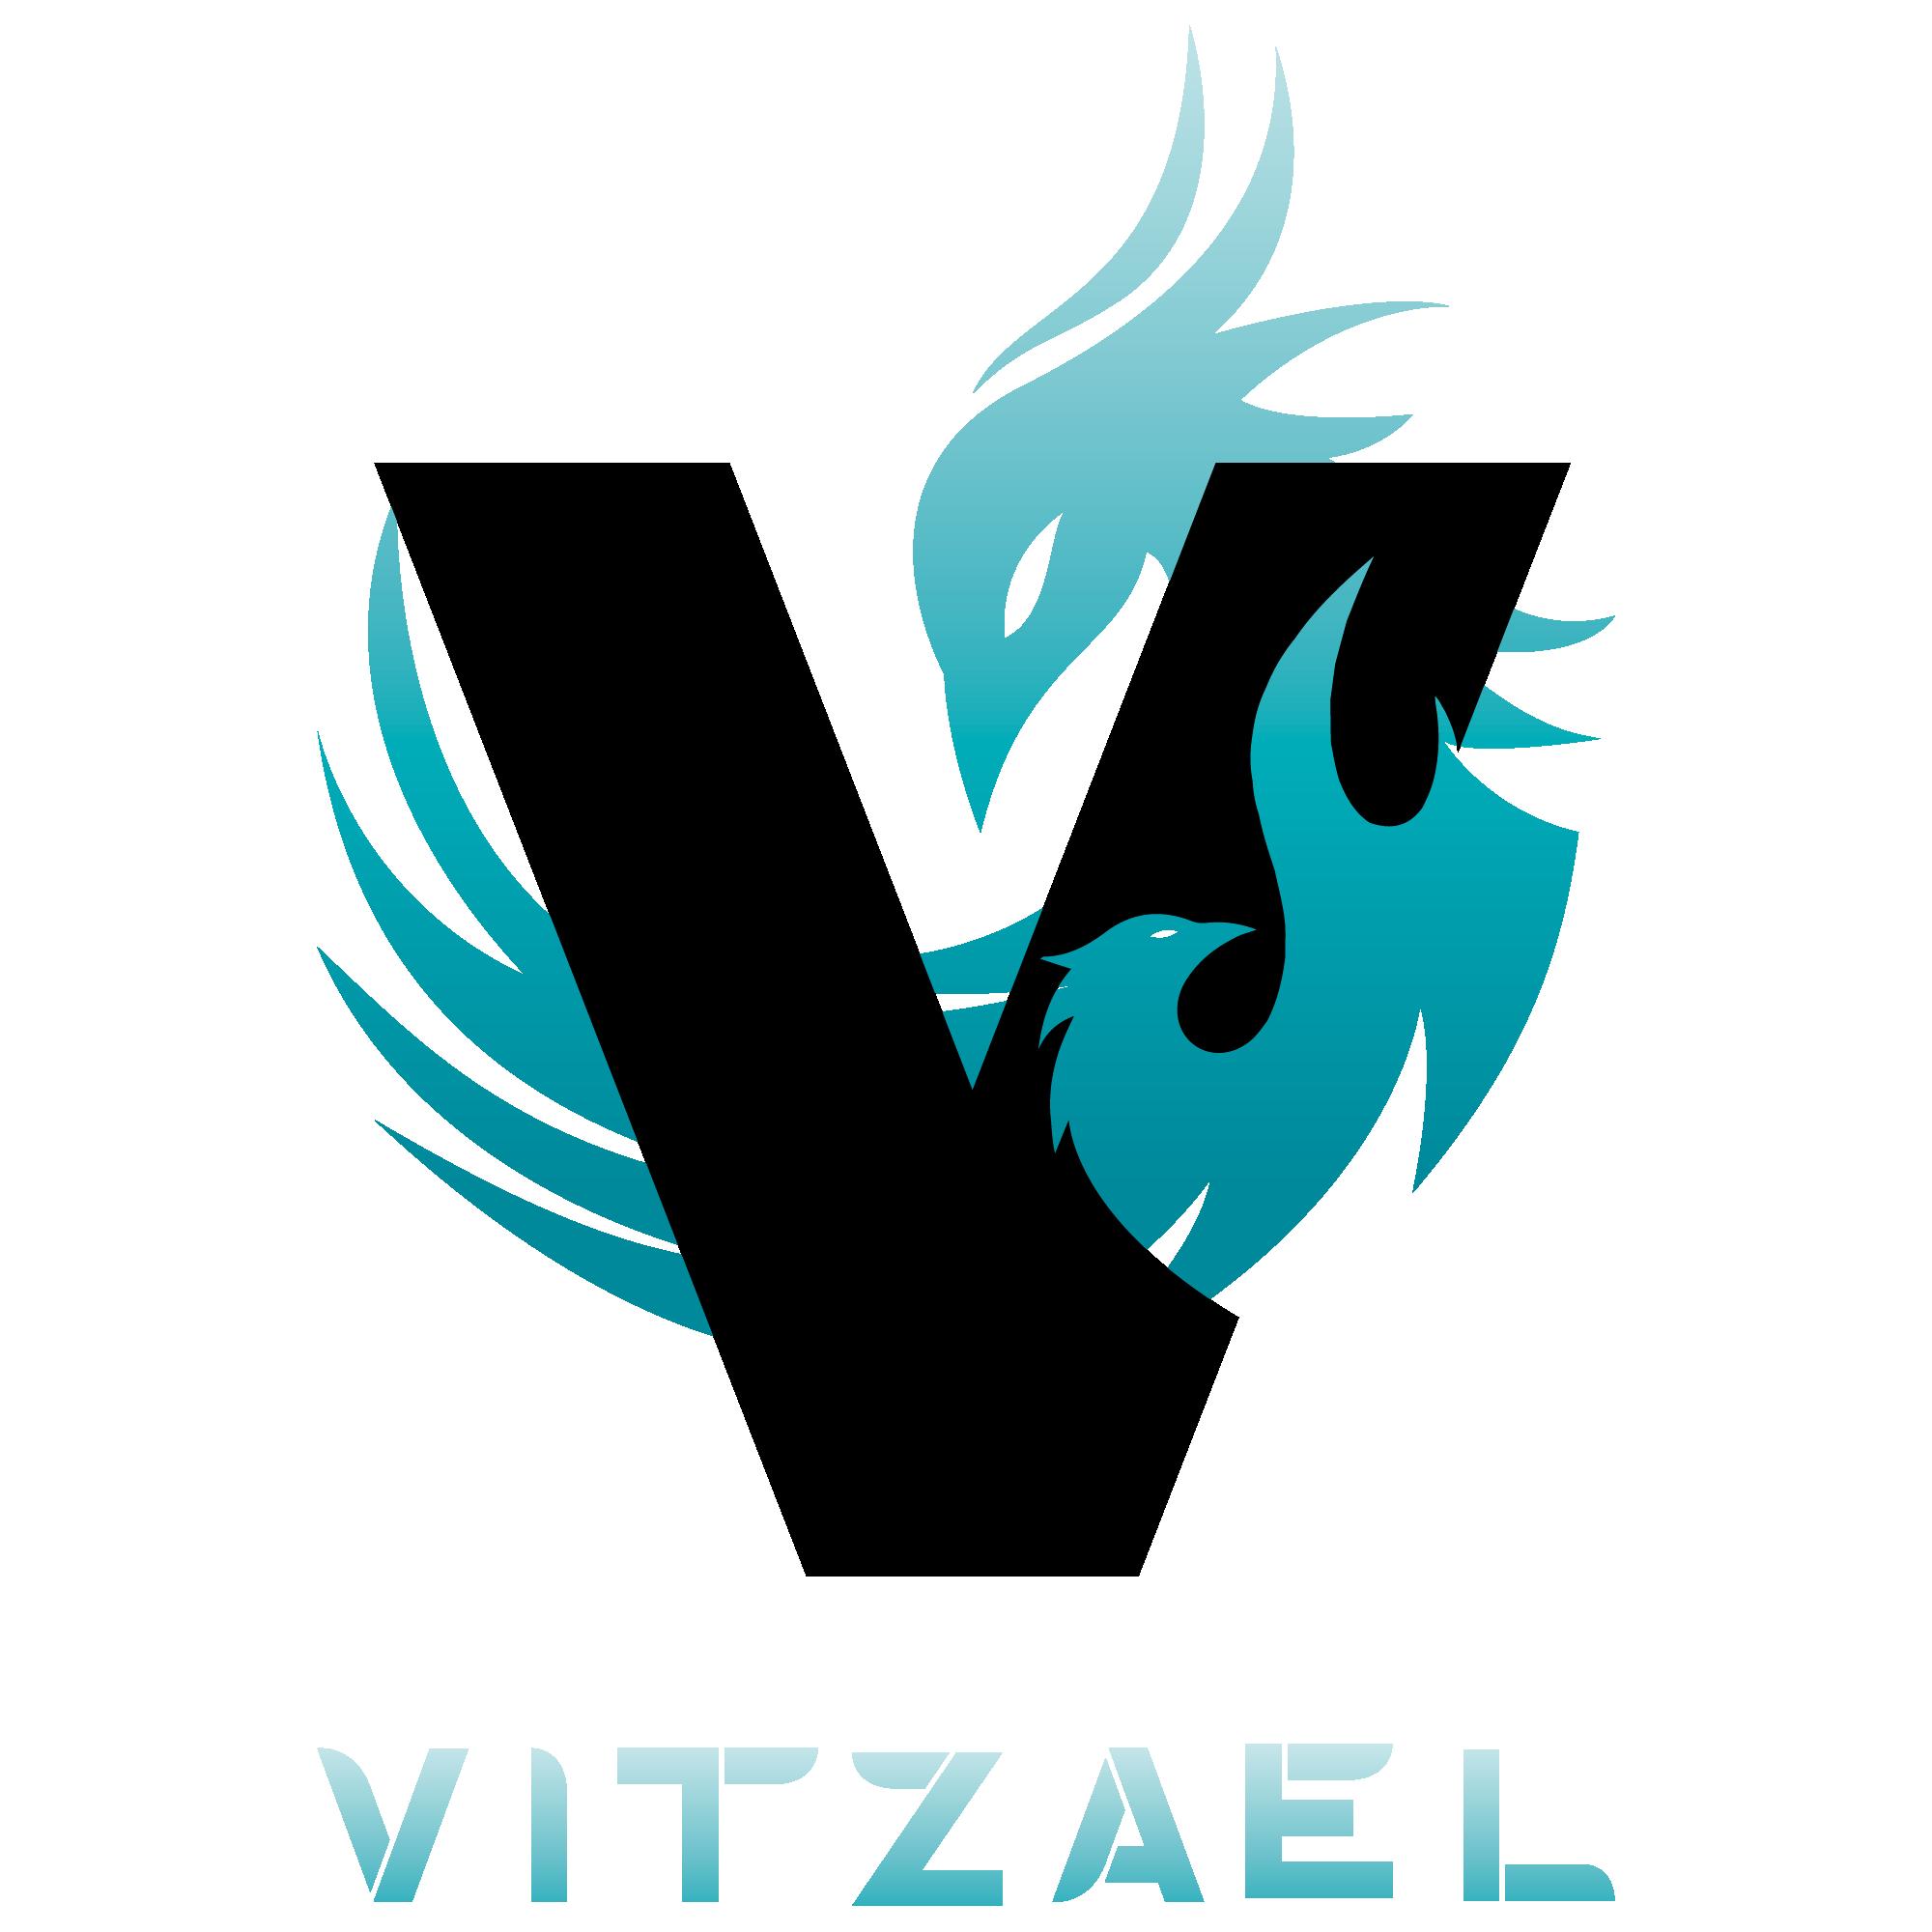 Vitzael Inc Ignites Business Productivity with Striking Digital Marketing